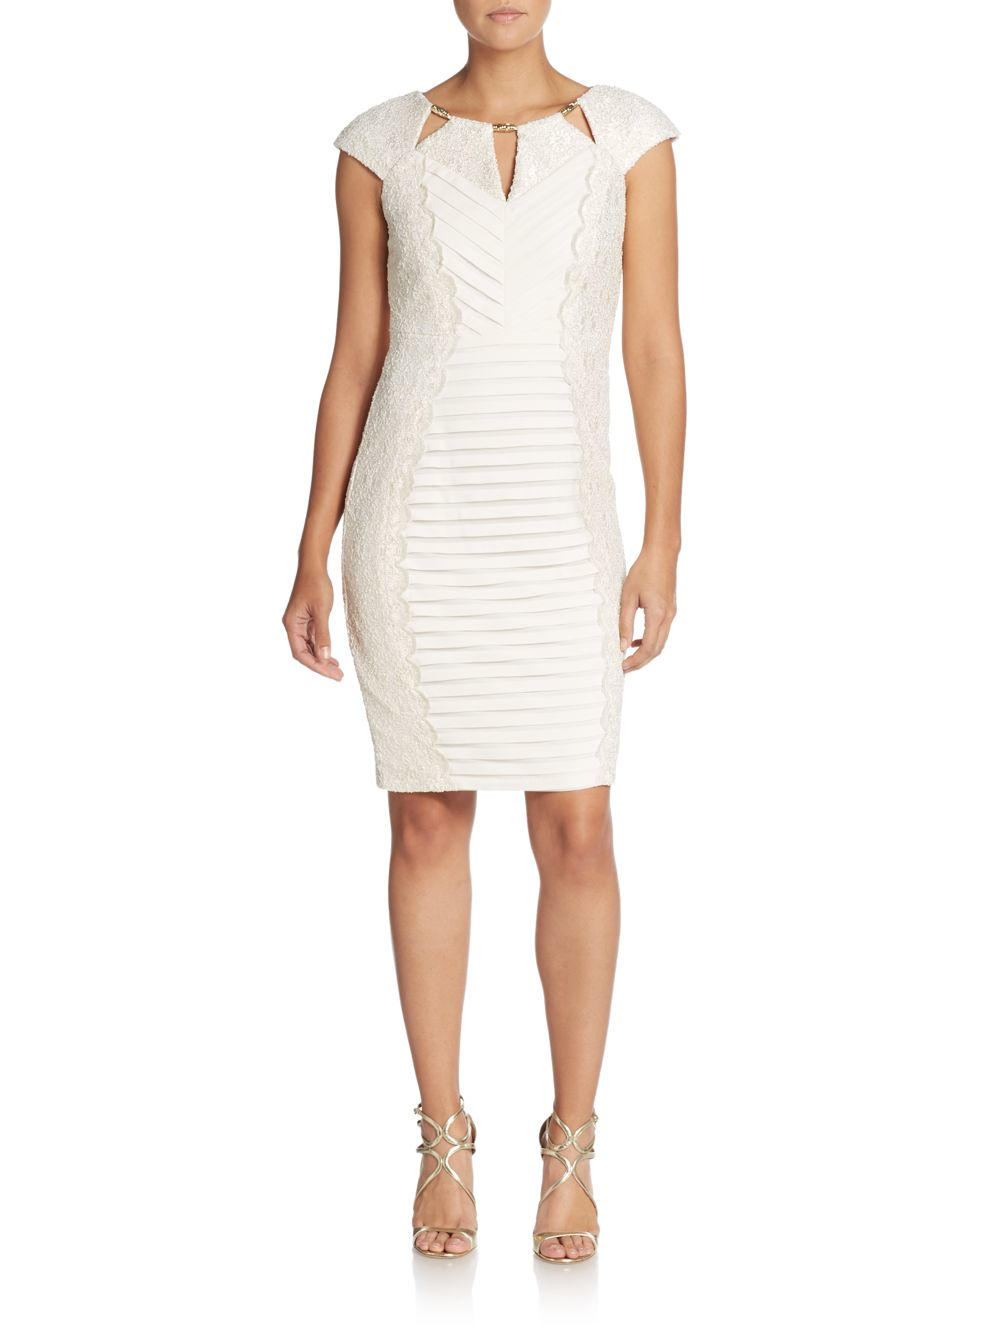 Lyst Jax Studio Lace Bandage Dress In White